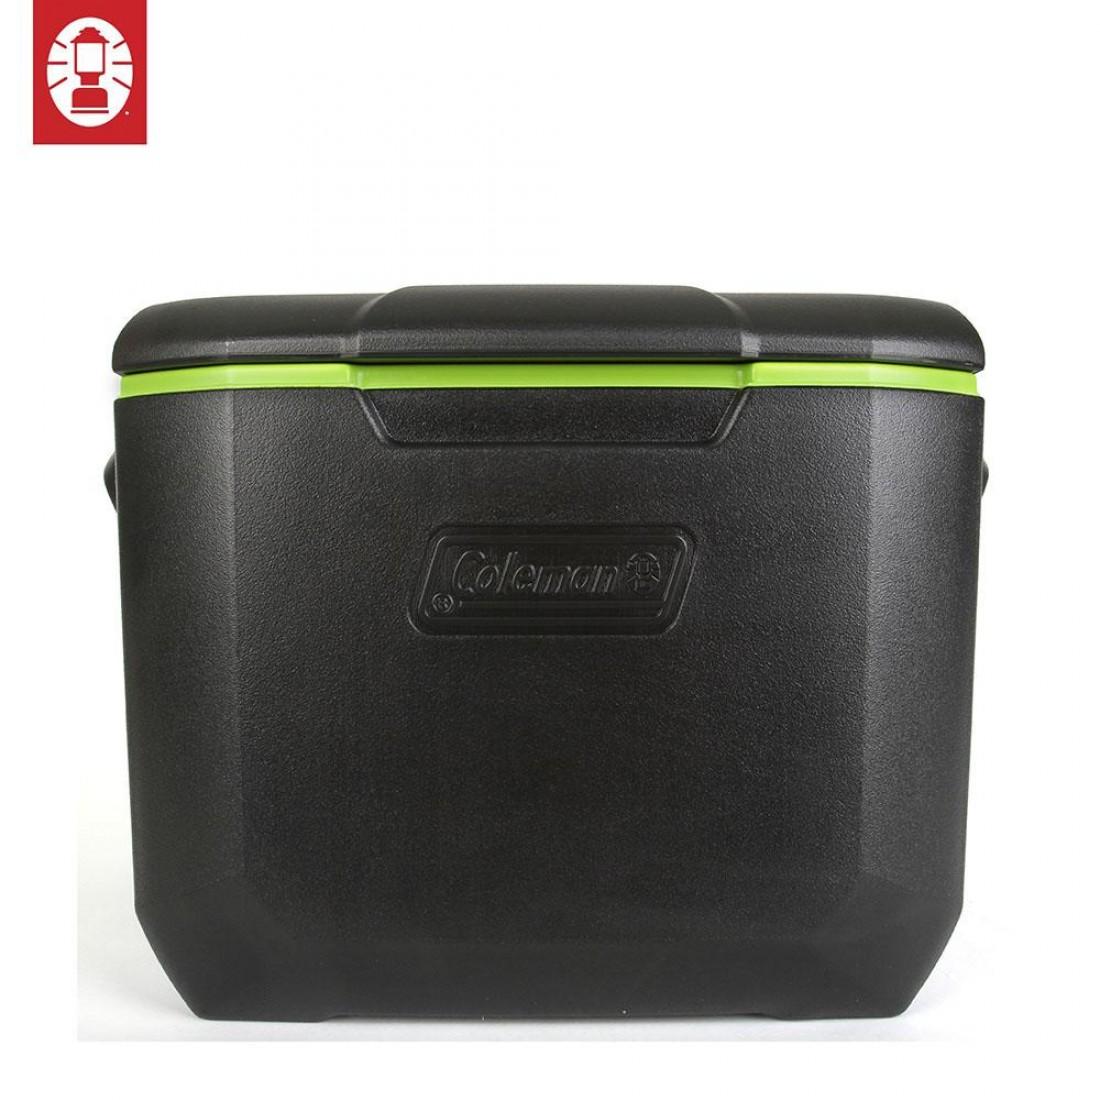 COLEMAN 60QT WHEELED COOLER BOX - Black/Green